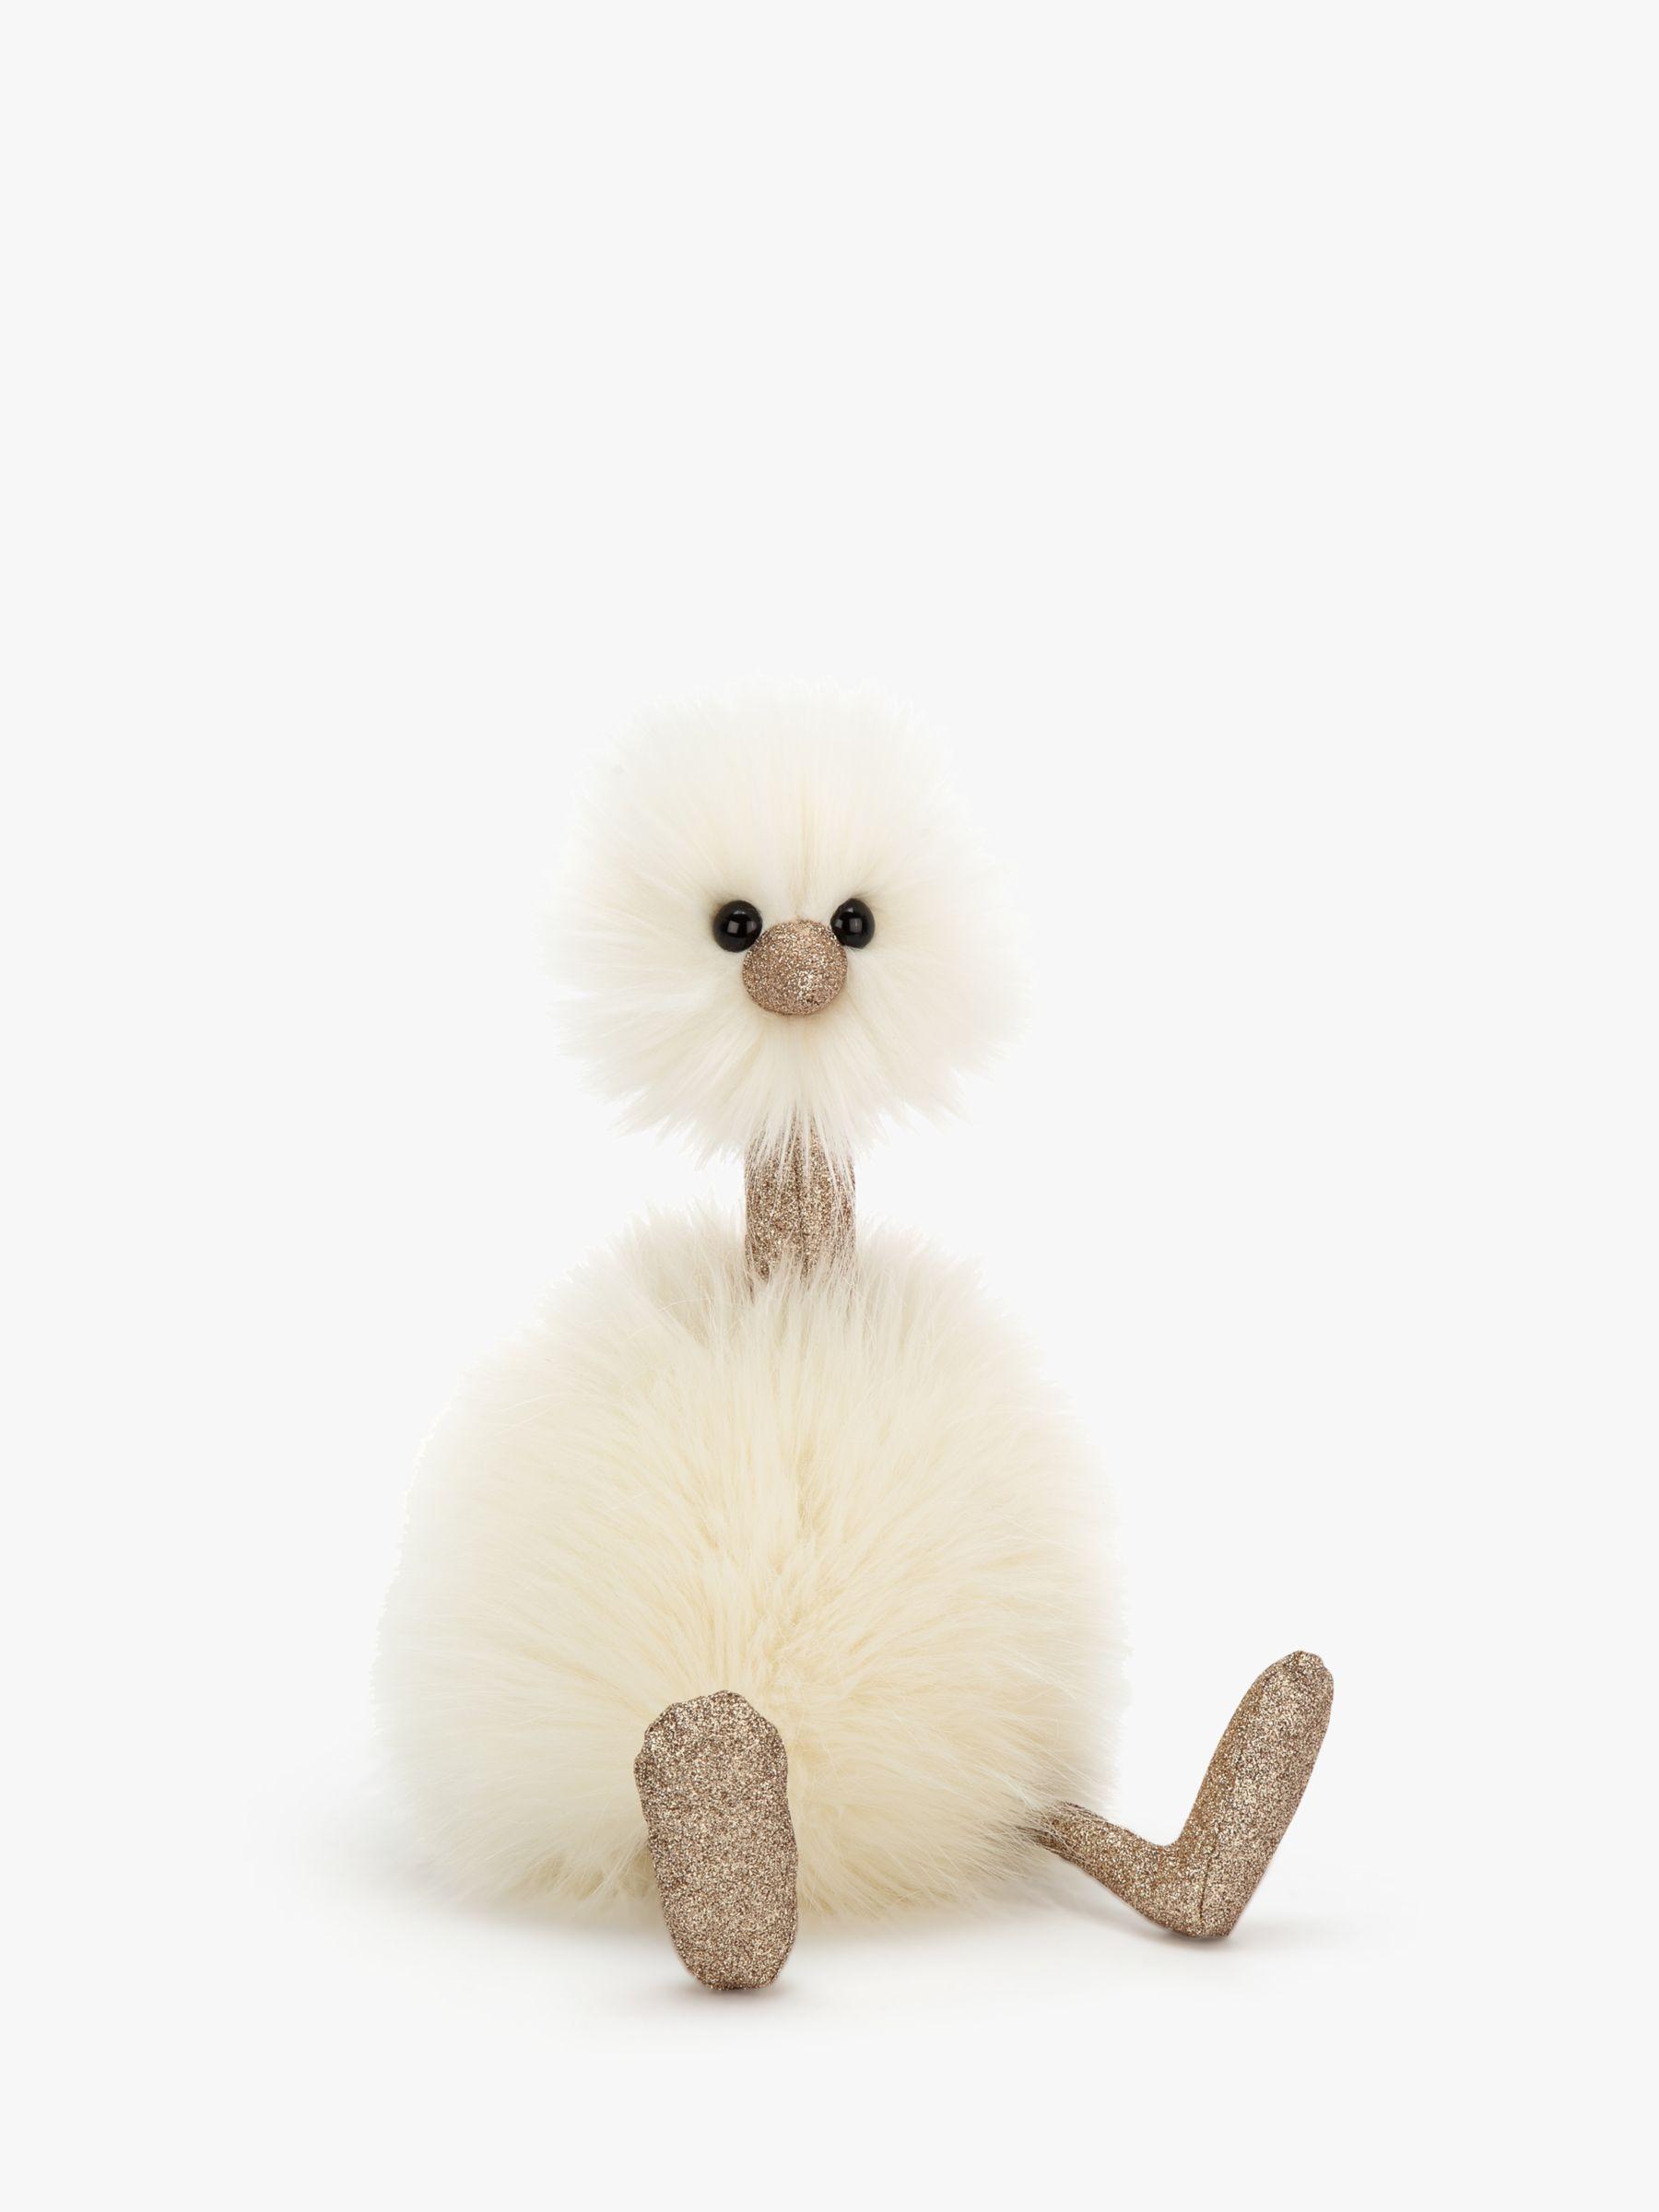 Jellycat Jellycat Pompom Glimmer Bird Soft Toy, Medium, Neutral